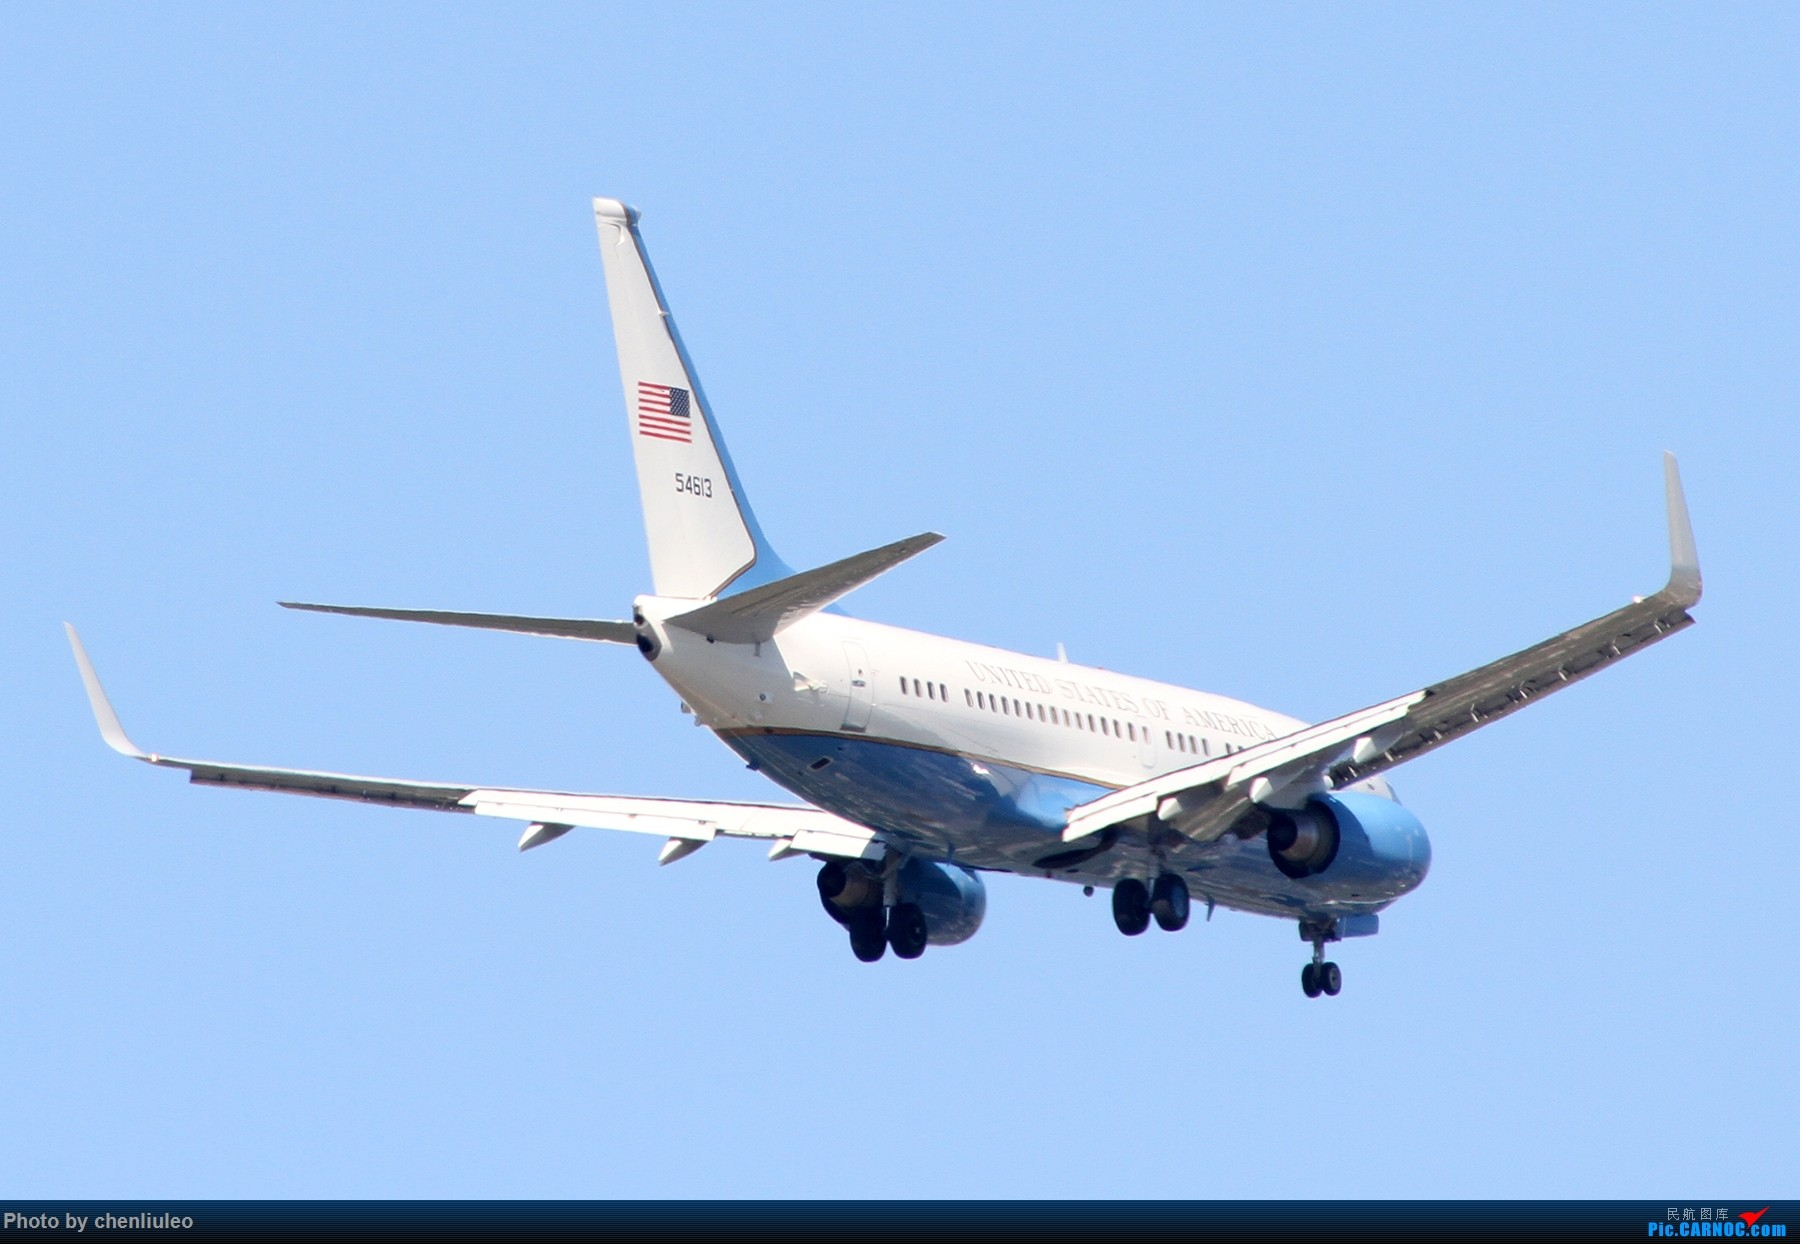 Re:[原创]【北美飞友会】本来是去等西南航空的新加州一号彩绘 结果有意外惊喜 美军C-40C BOEING C-40C 737-7DM 05-4613 美国圣路易斯机场